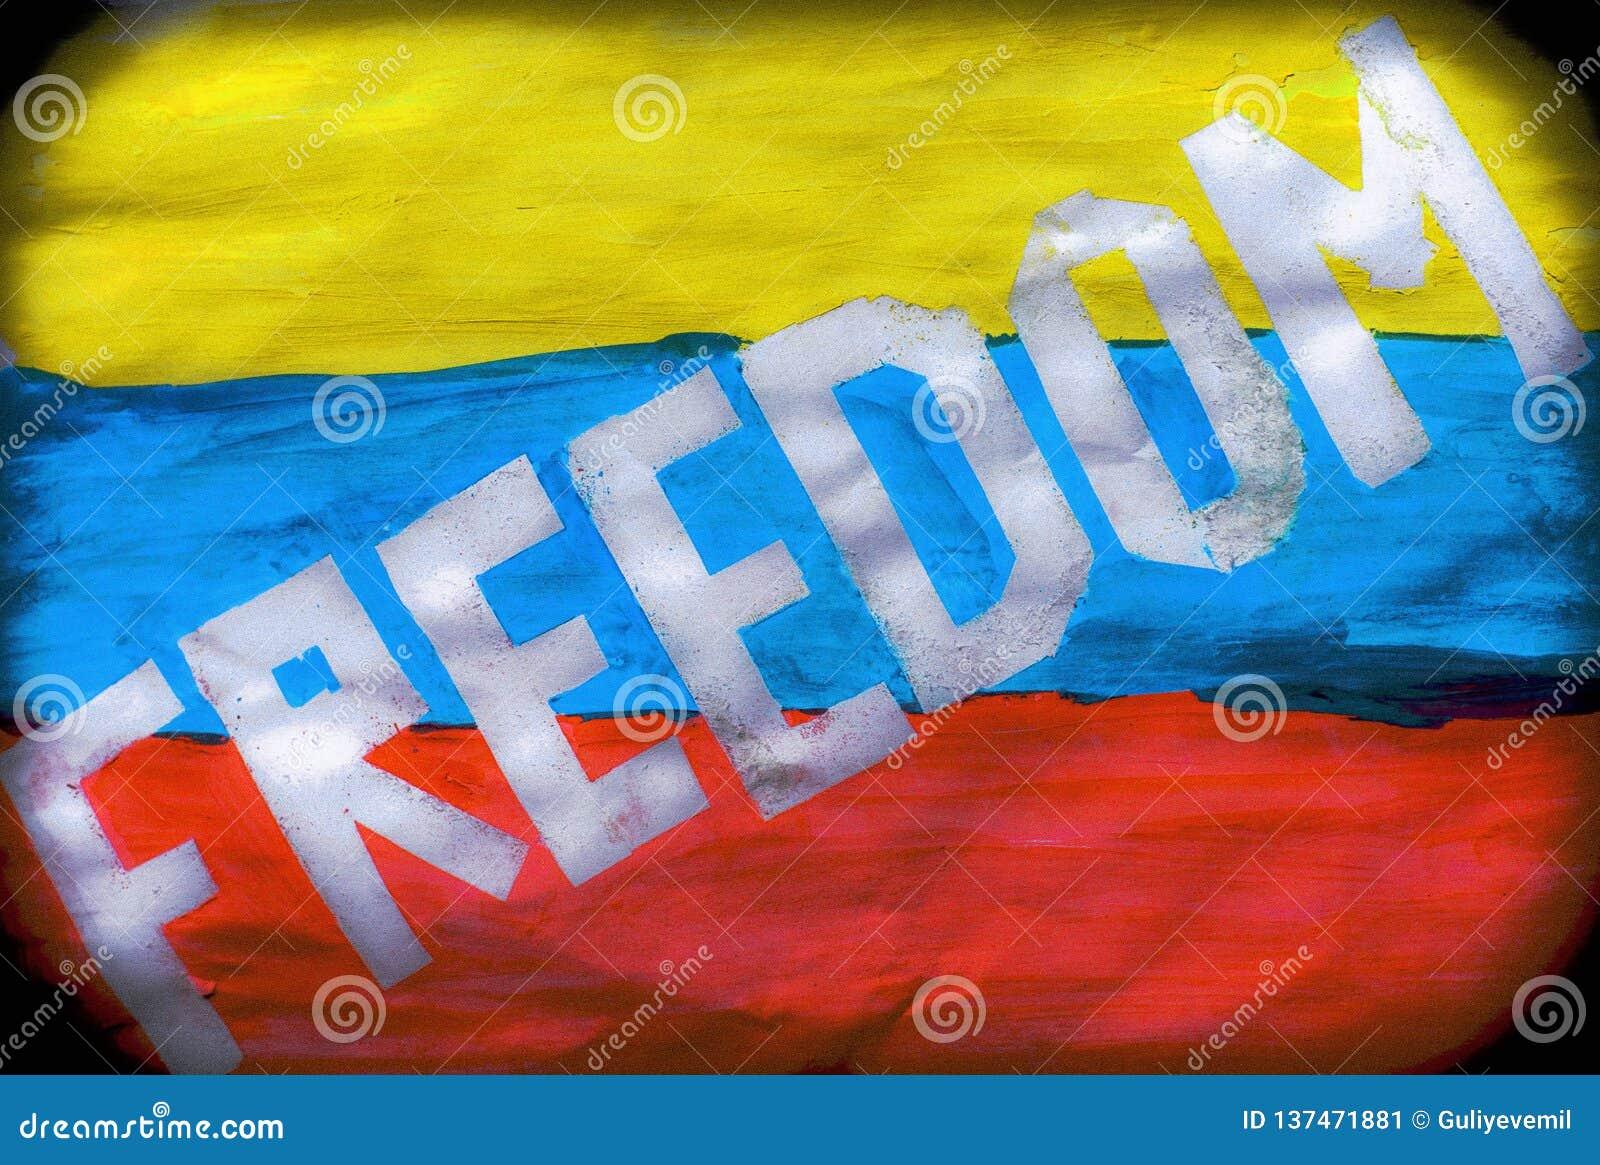 Venezuela January 2019 protests. flag freedom slogan. Juan Guaidó opposition leader